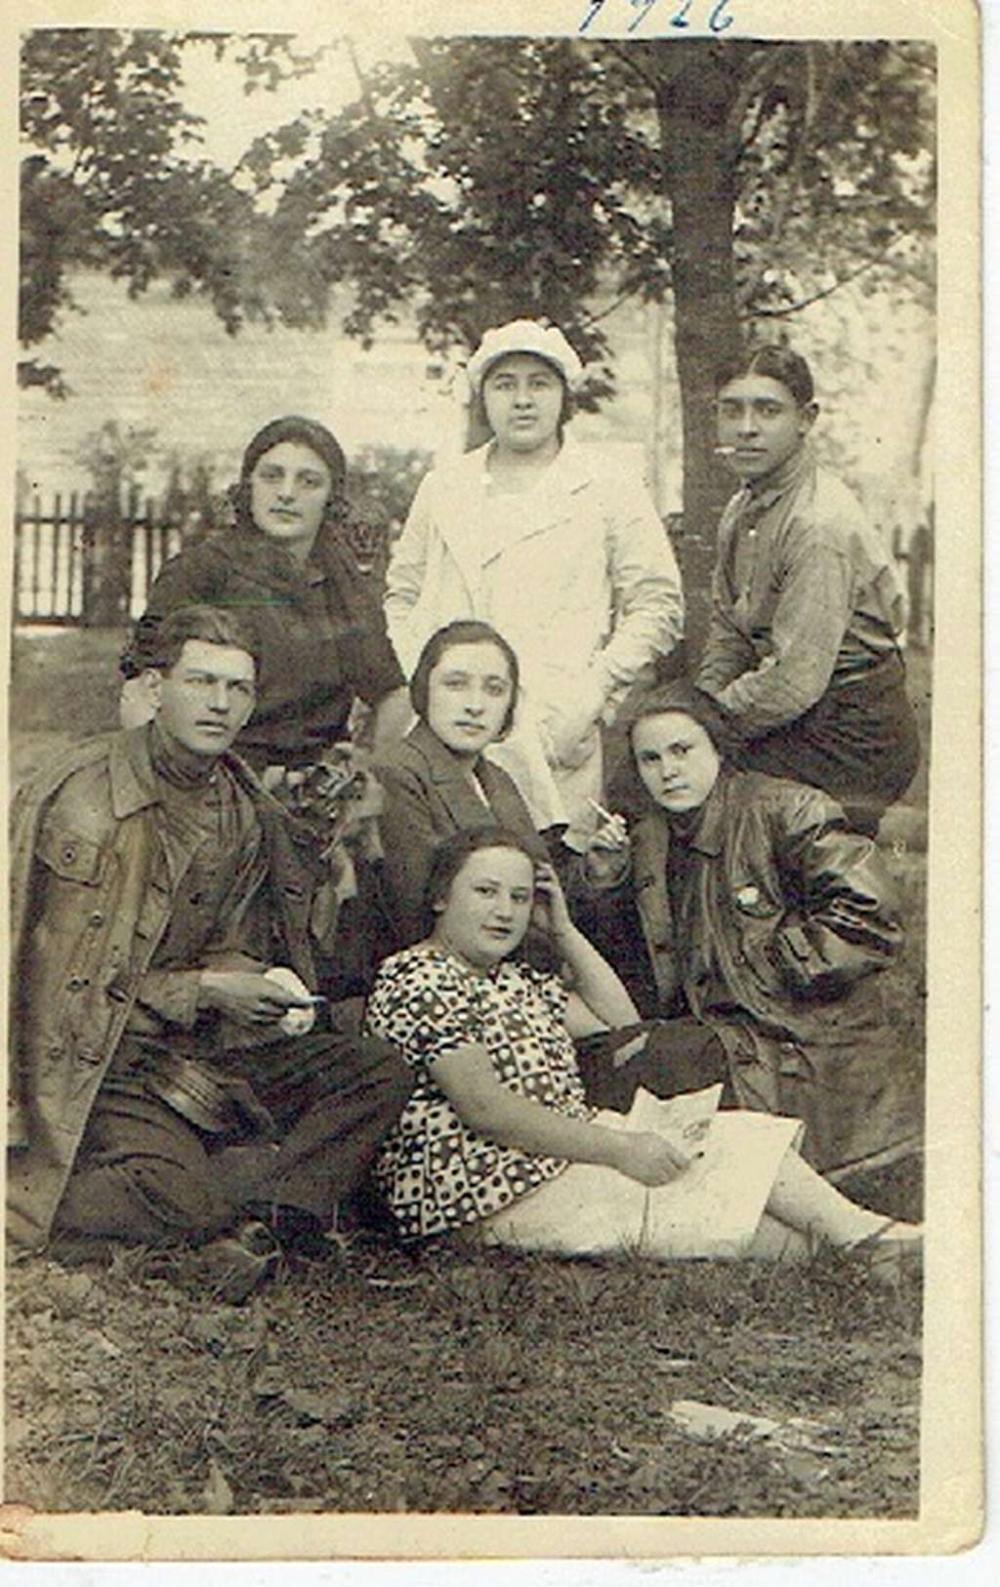 Group photo of Jewish NKVD members, Ovruch, Ukraine, 1926, sent to Palestine, in Russian.